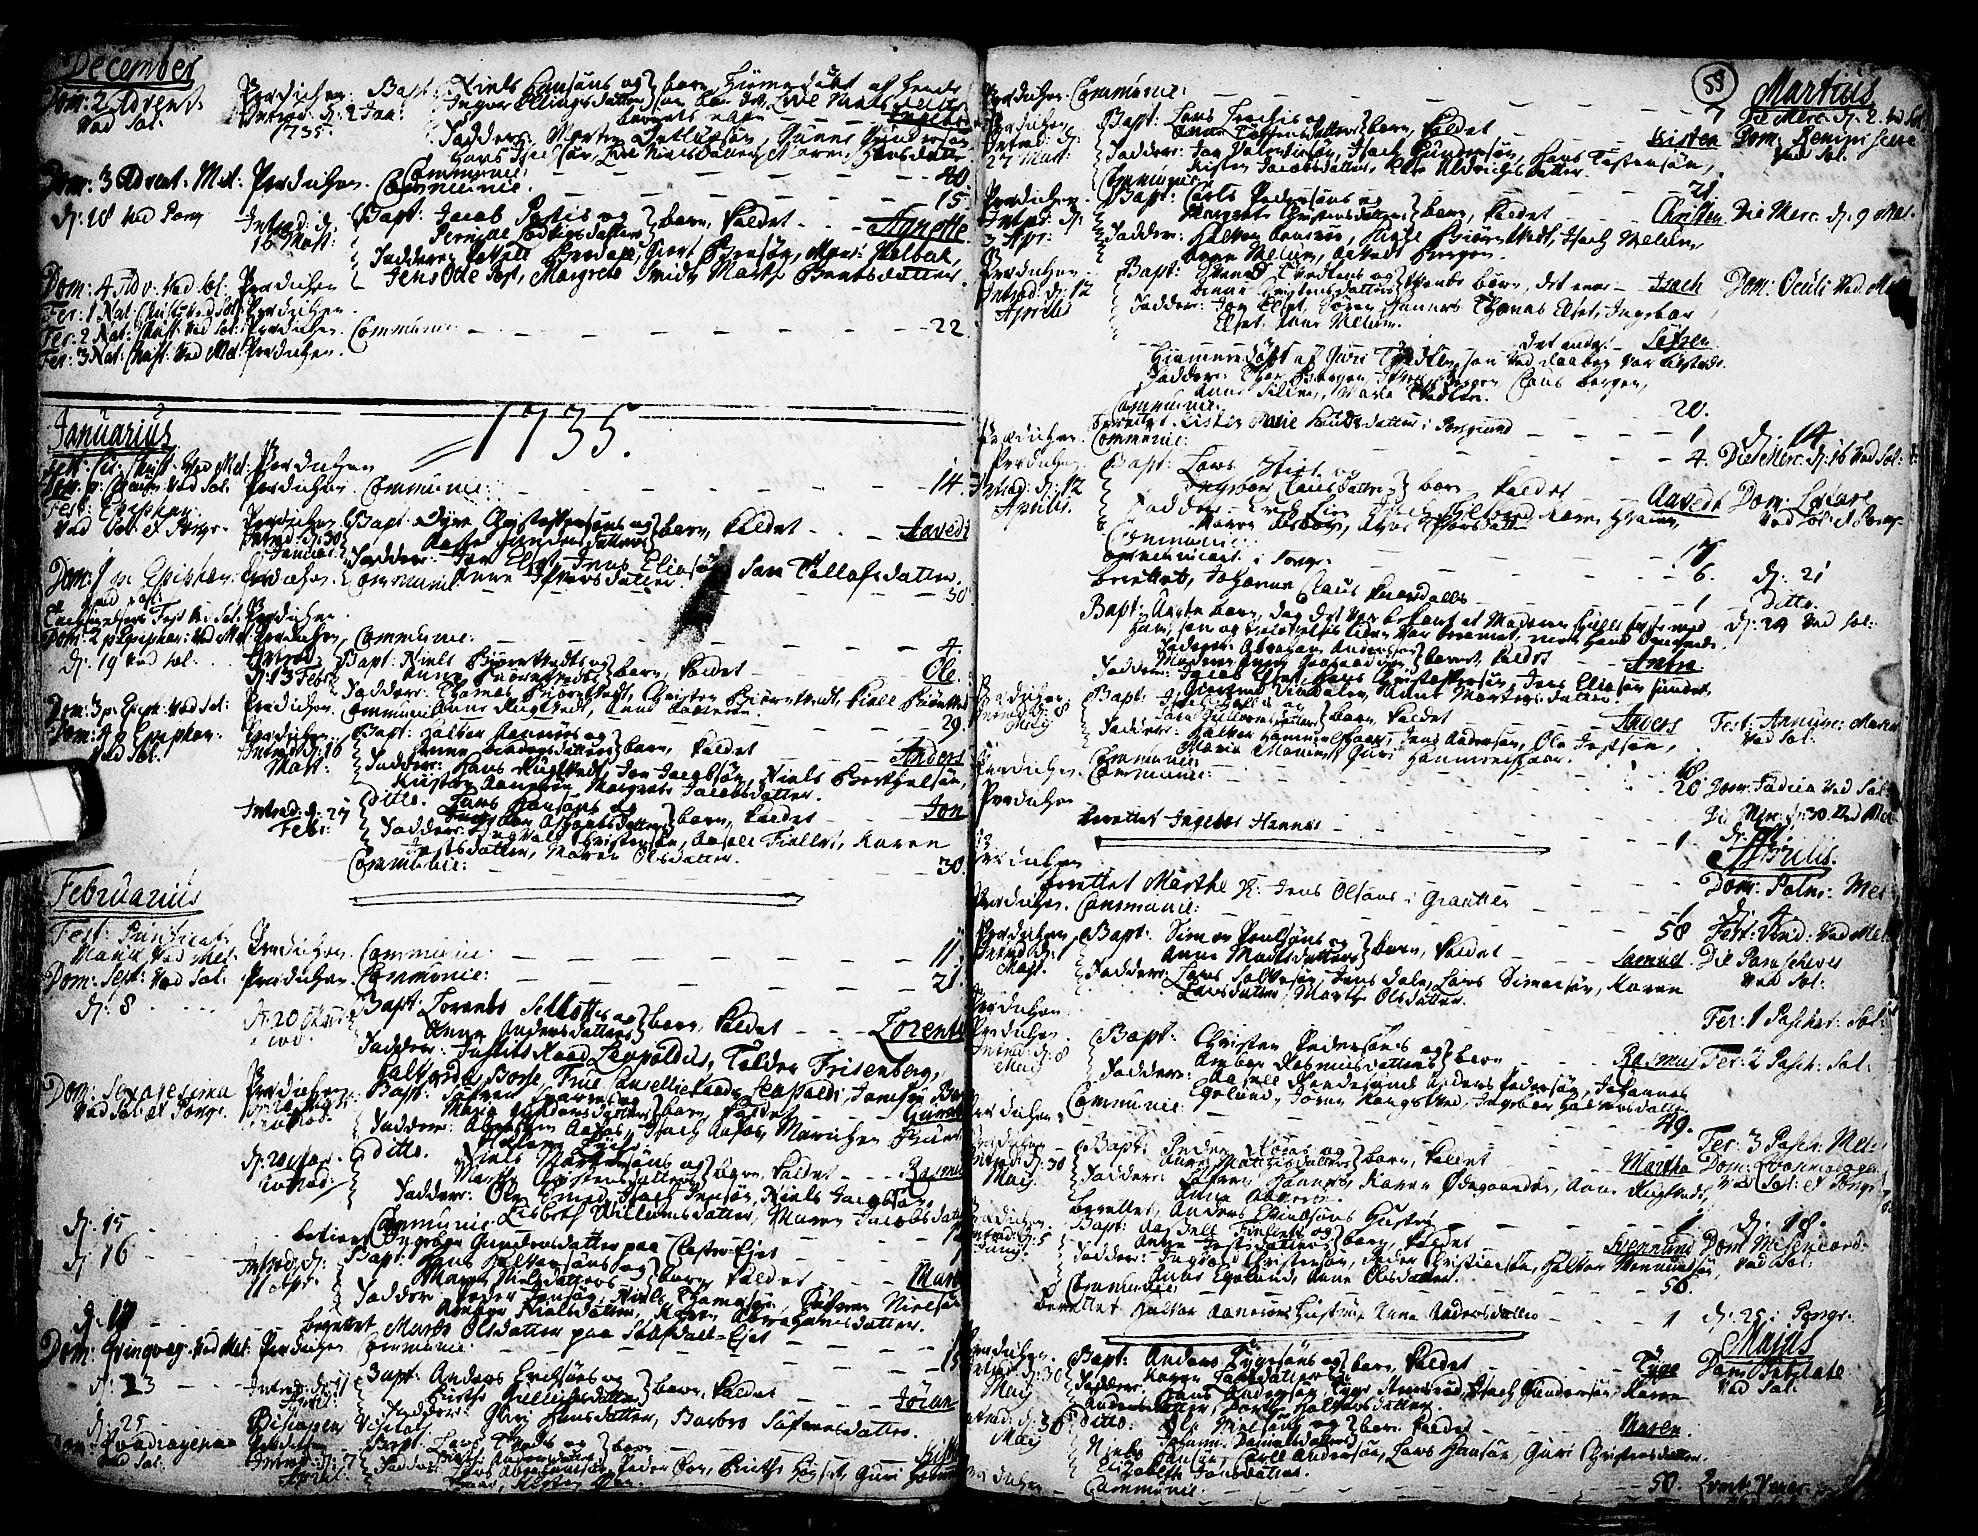 SAKO, Solum kirkebøker, F/Fa/L0002: Ministerialbok nr. I 2, 1713-1761, s. 55